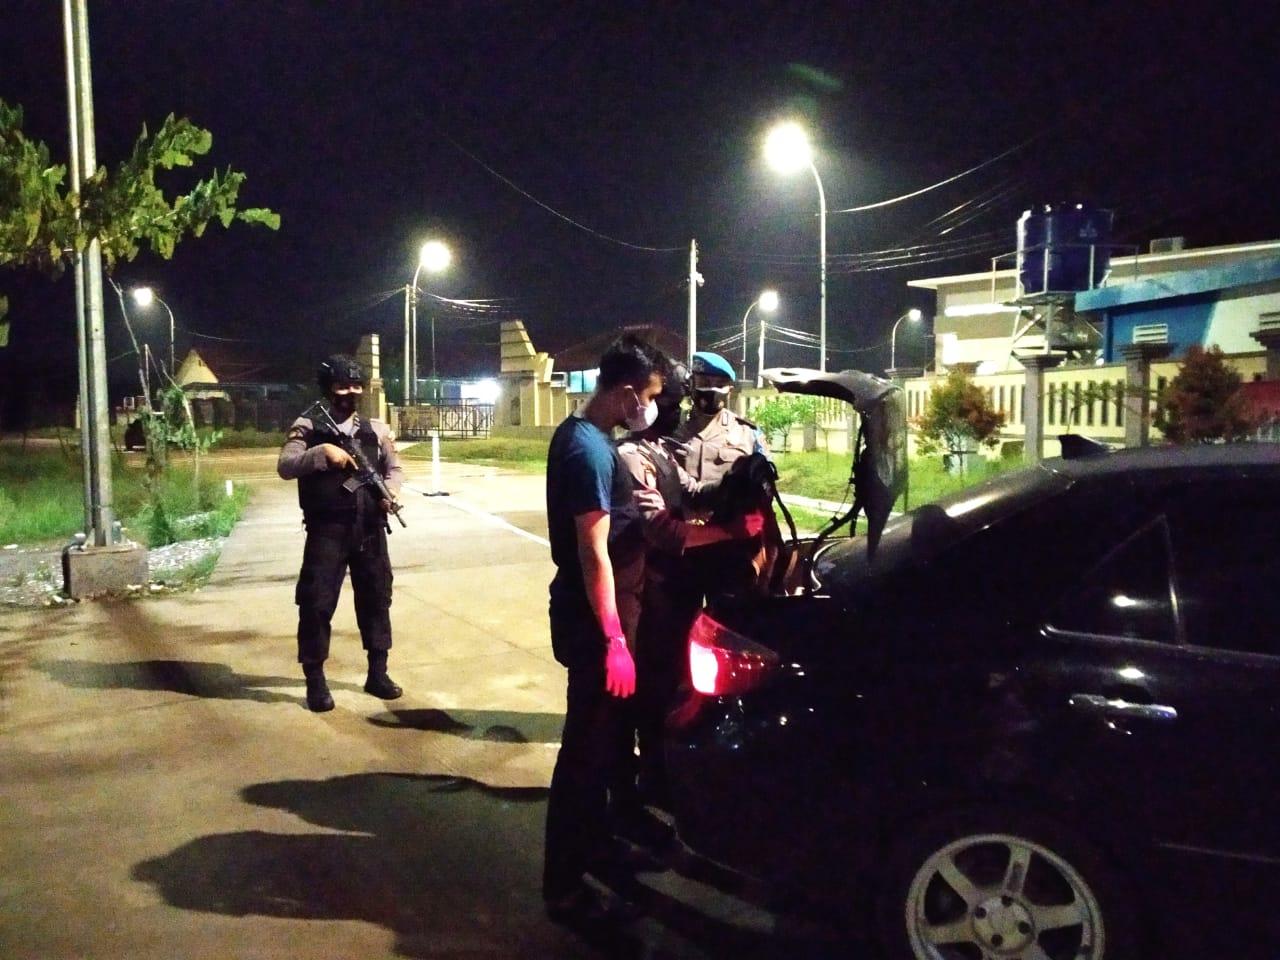 Gambar Insiden Penyerangan Terduga Teroris, Keamanan di Polres dan Polsek Lebih Ditingkatkan 17